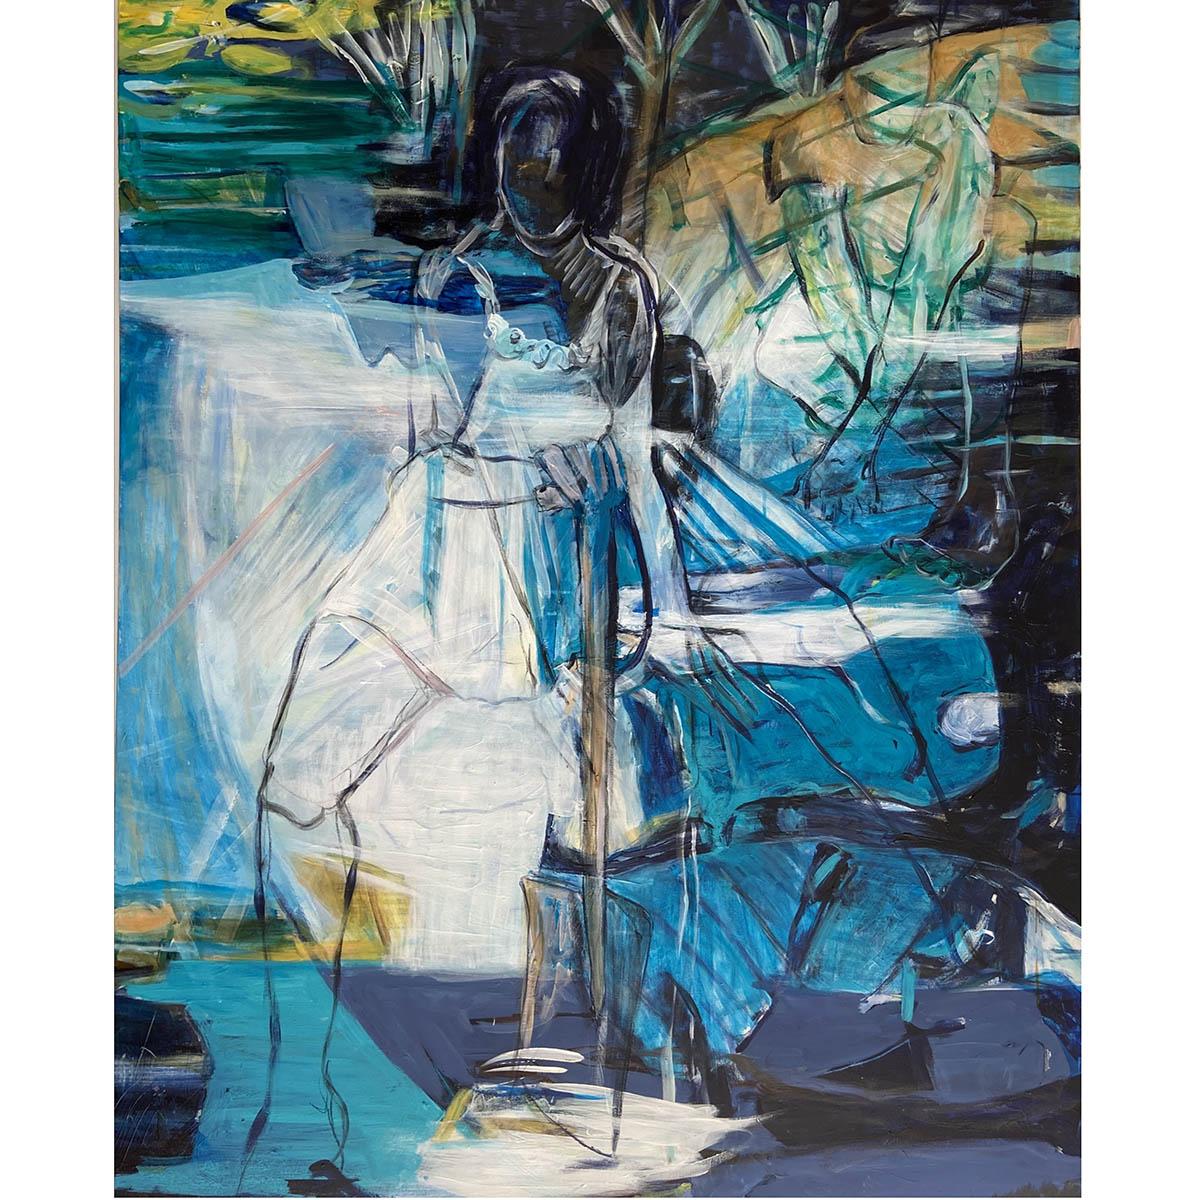 Karin Germeyer-Kihm: Anfang, 2020, Acryl auf Leinwand, 150x120 cm